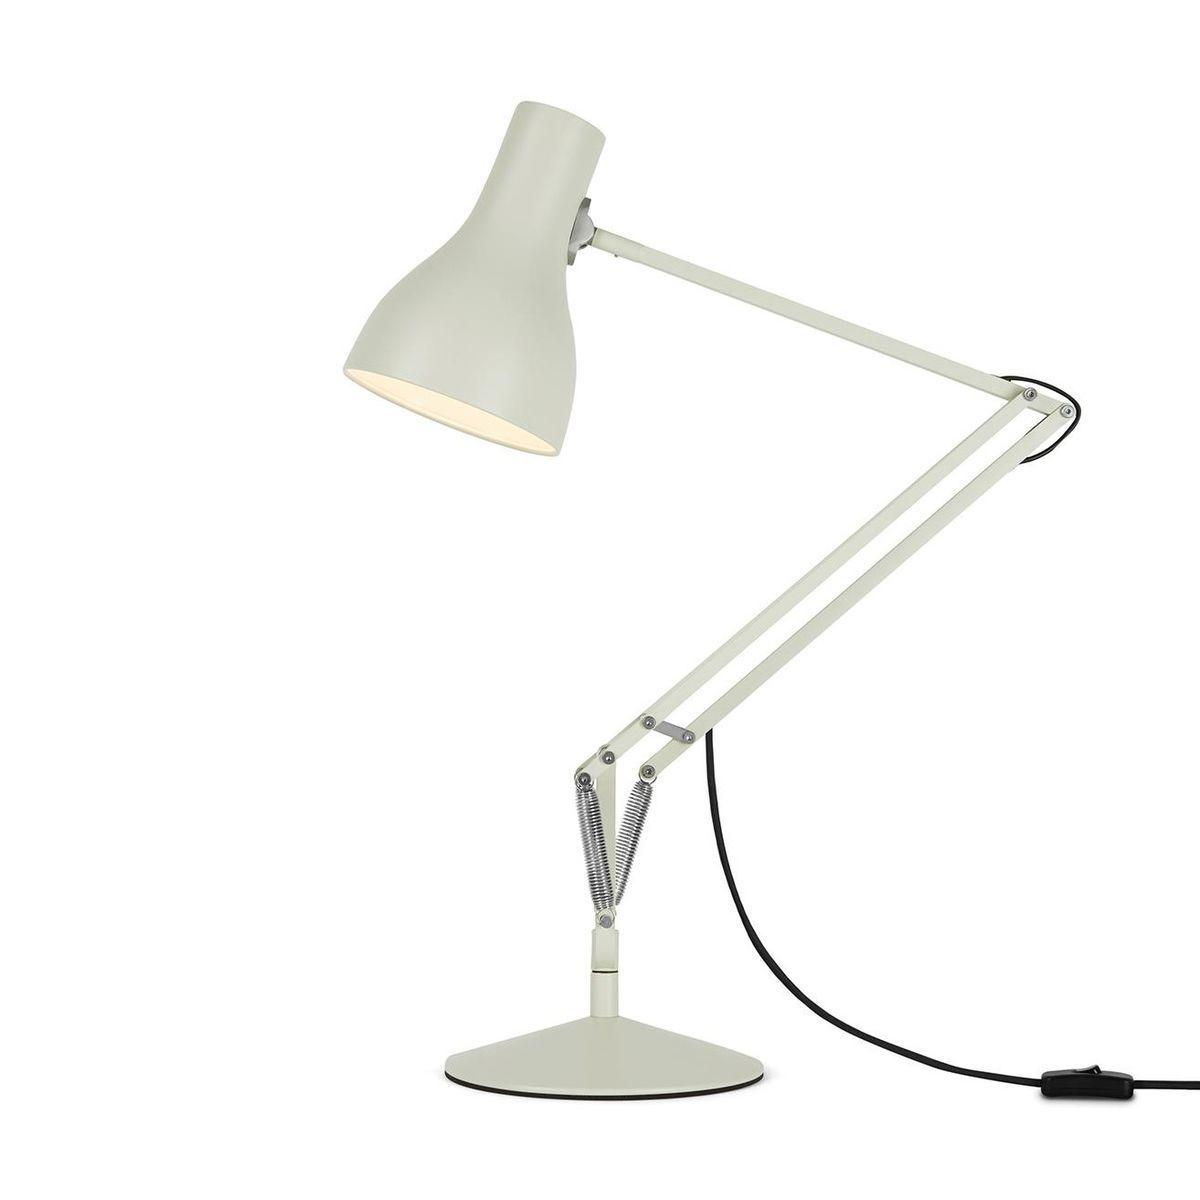 type 75 lampe de bureau led anglepoise. Black Bedroom Furniture Sets. Home Design Ideas